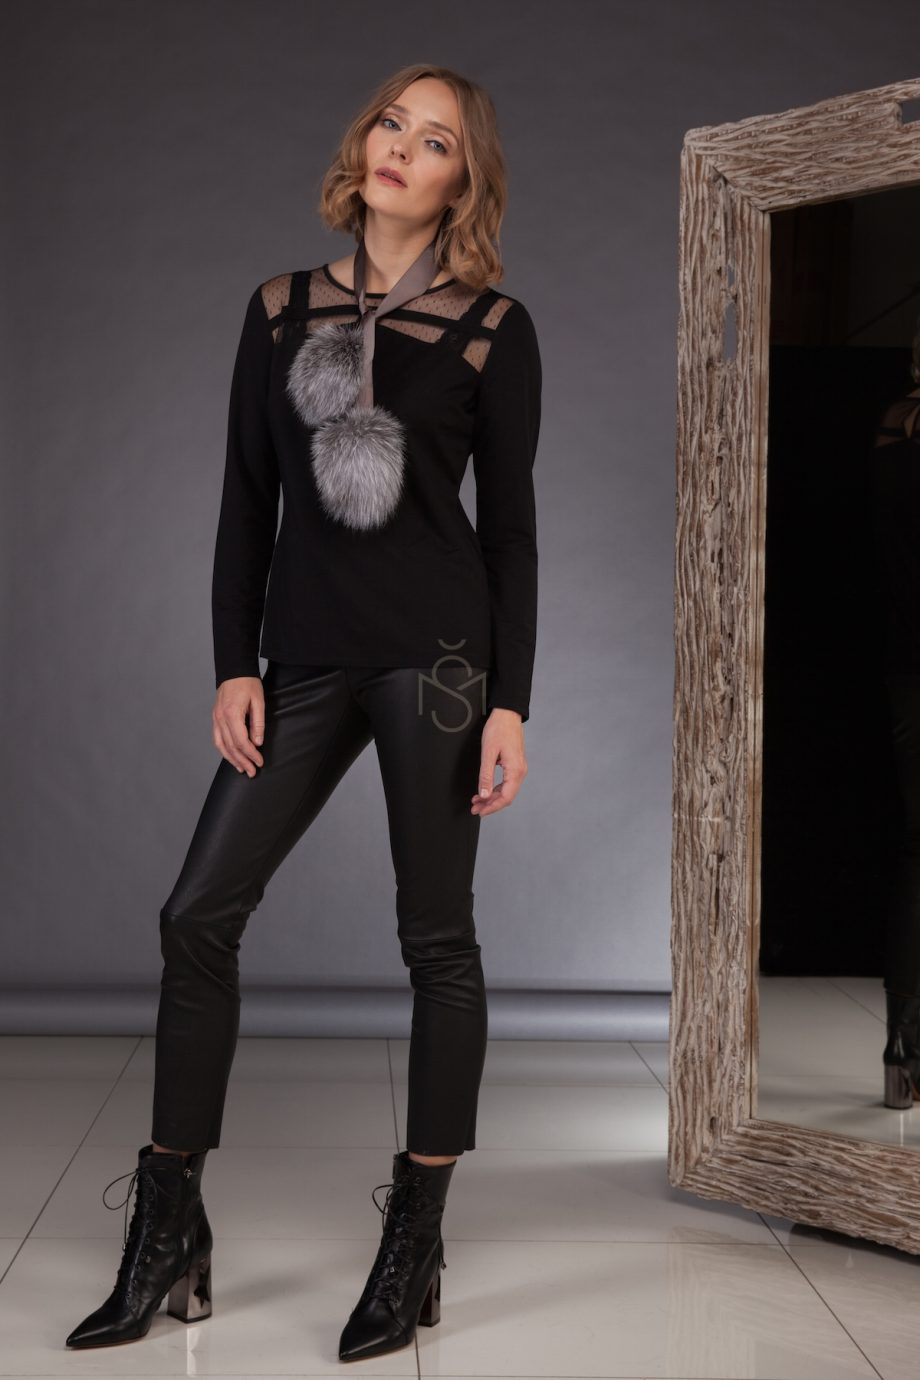 Ribbon with silver fox pom-poms made by SILTA MADA fur studio in Vilnius